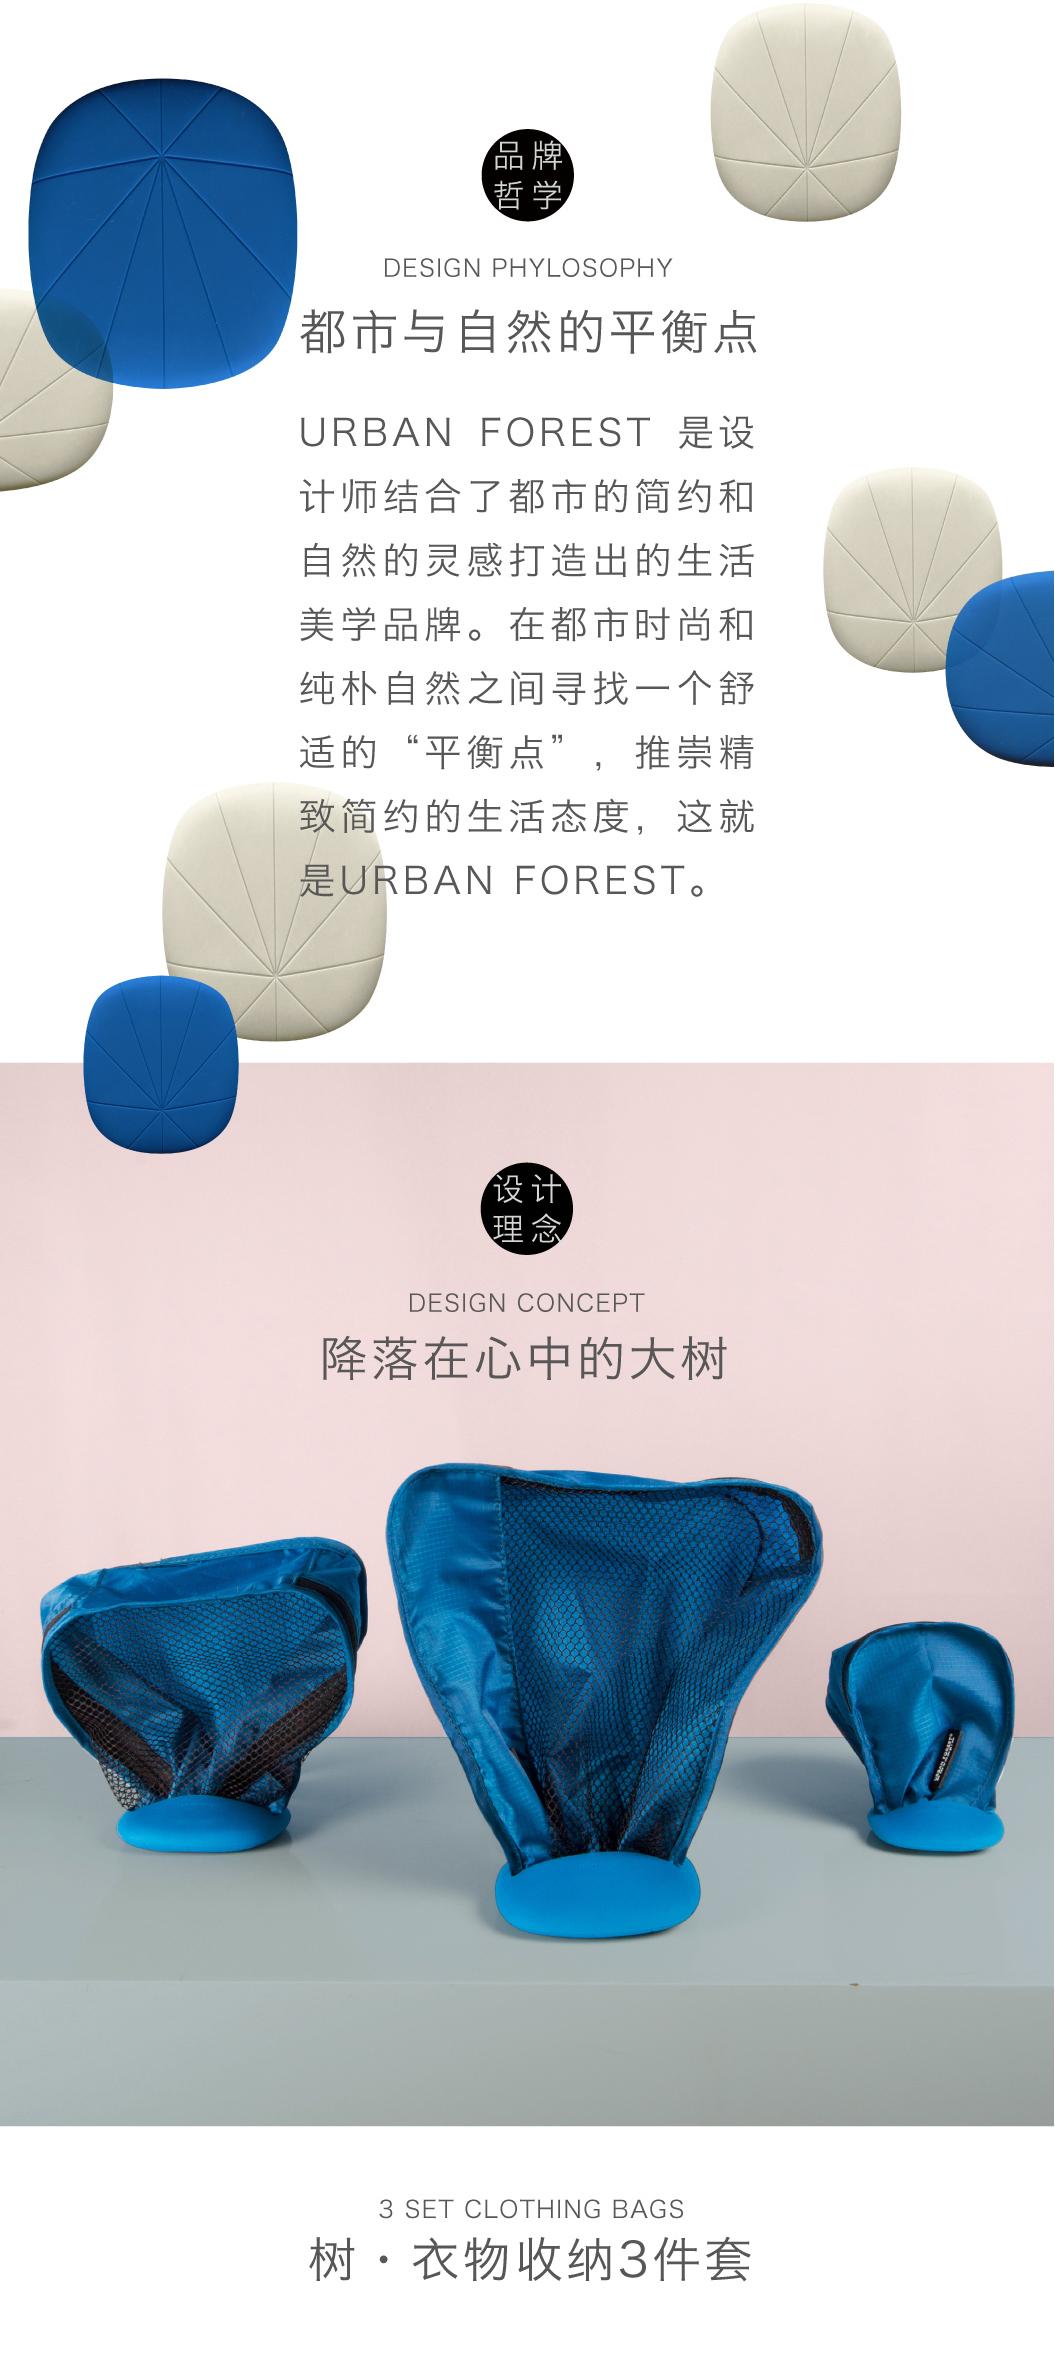 URBAN FOREST 都市之森 收纳鞋袋